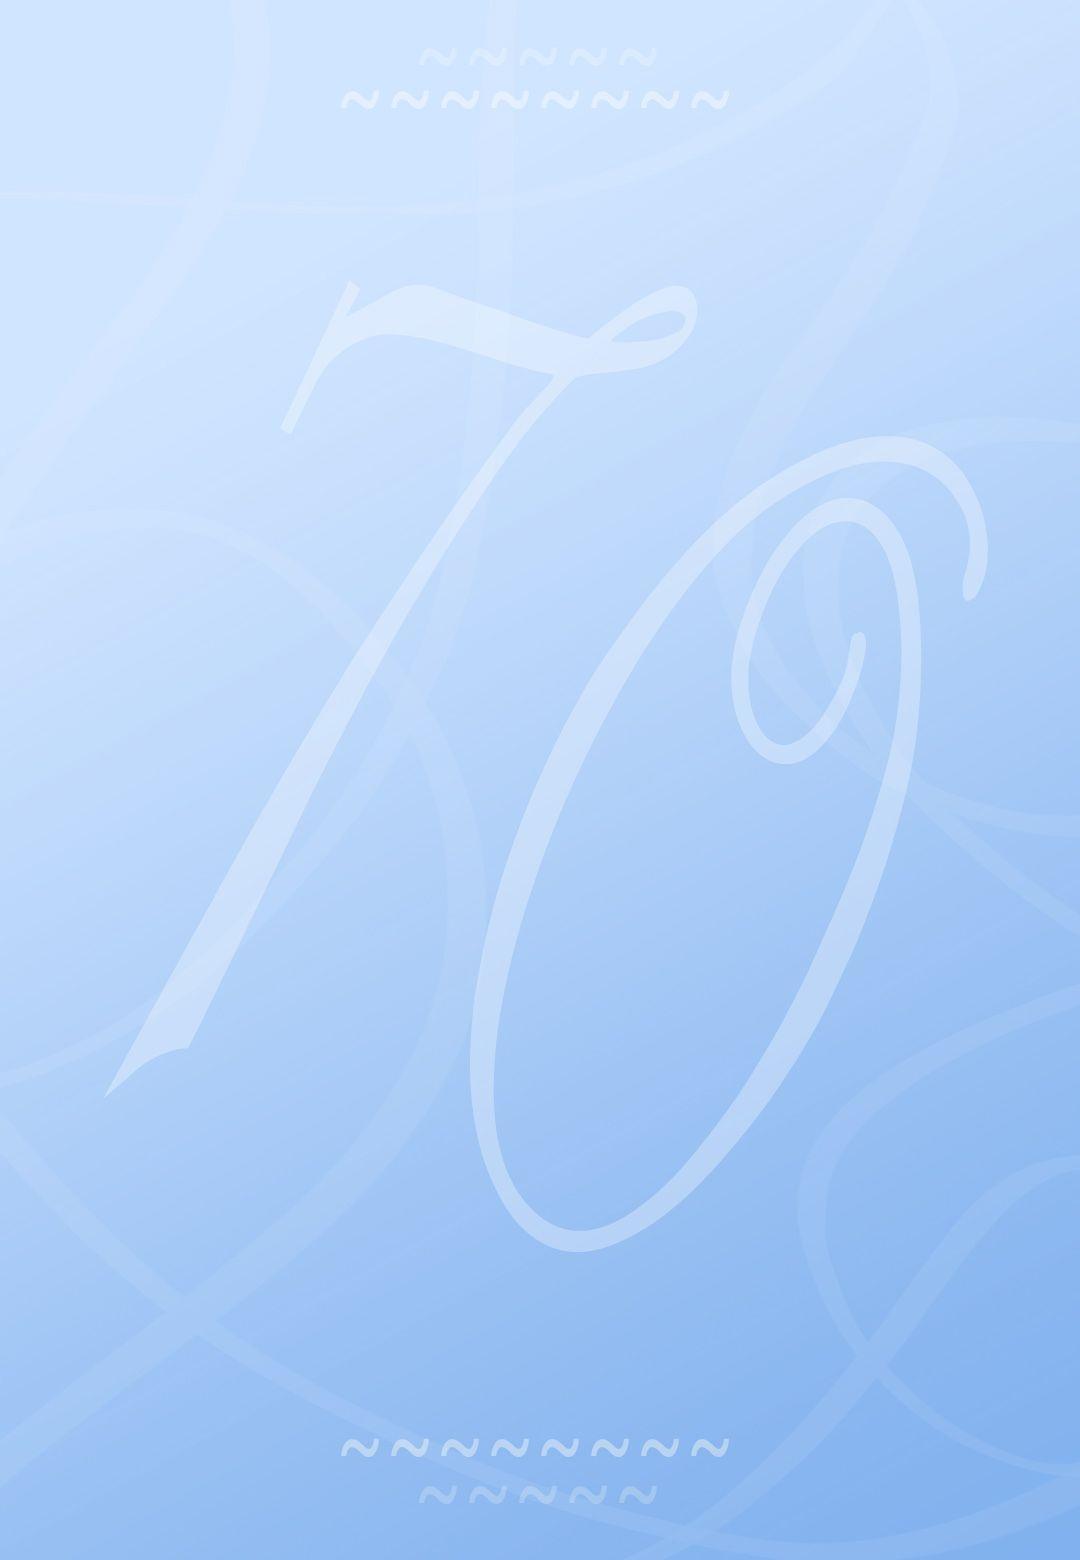 Free Printable 70Th Birthday Invitation | Favorite Public Art | Free - Free Printable 70Th Birthday Party Invitations